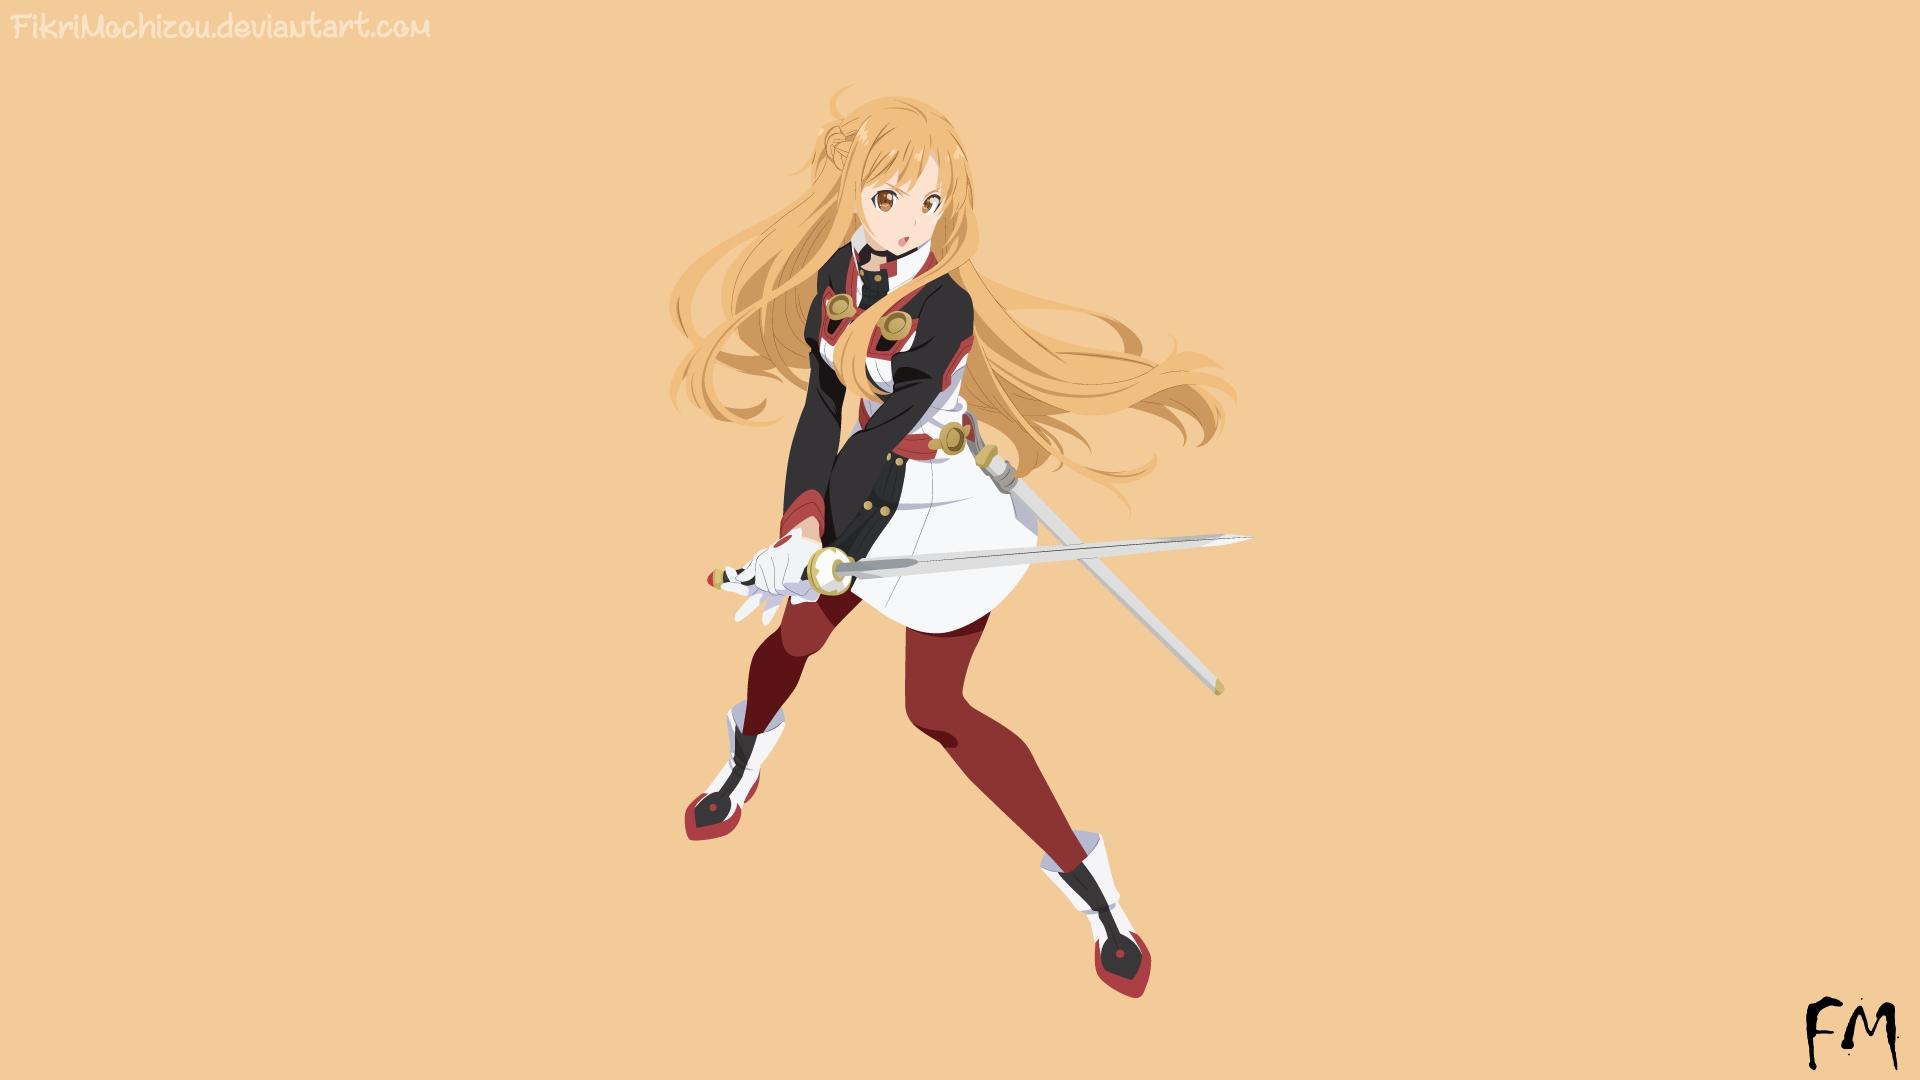 Desktop Wallpaper Sao Sword Art Online Asuna Anime Girl Hd Image Picture Background Fowf9s